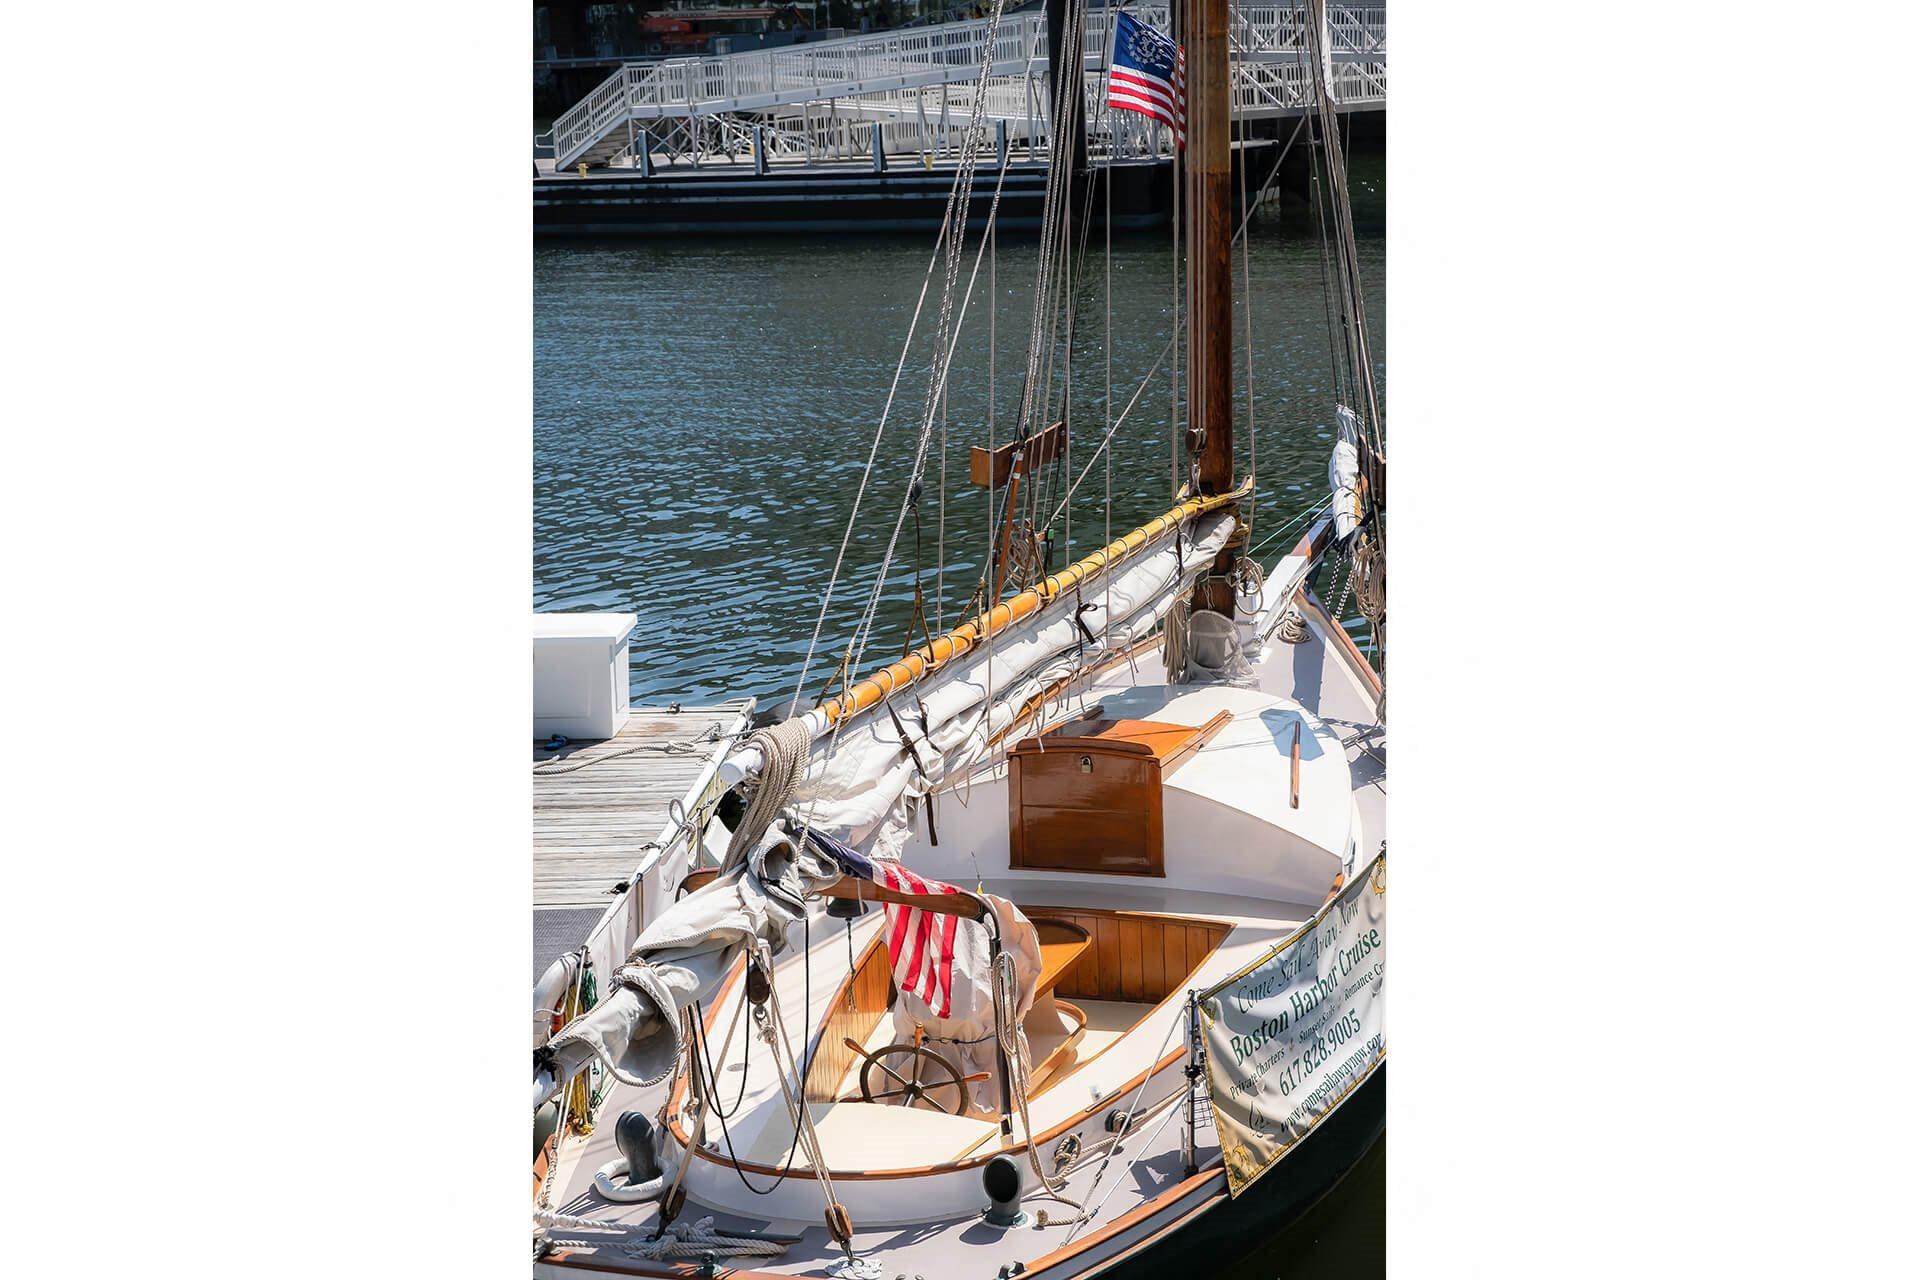 Sailing in Seaport area near Waterside Place by Windsor, 505 Congress St, Boston